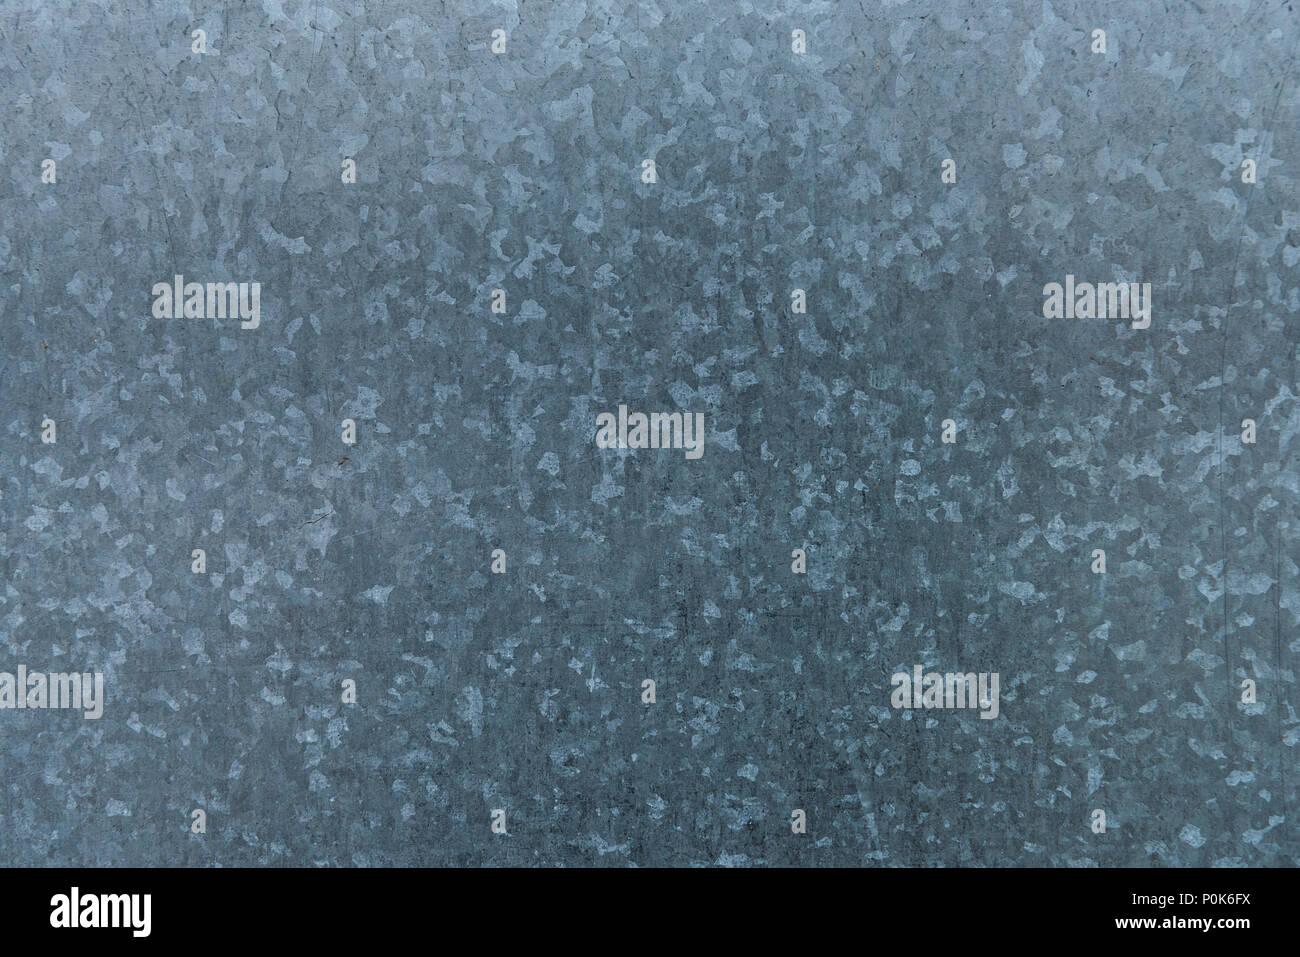 Galvanized iron sheet metal texture - Stock Image